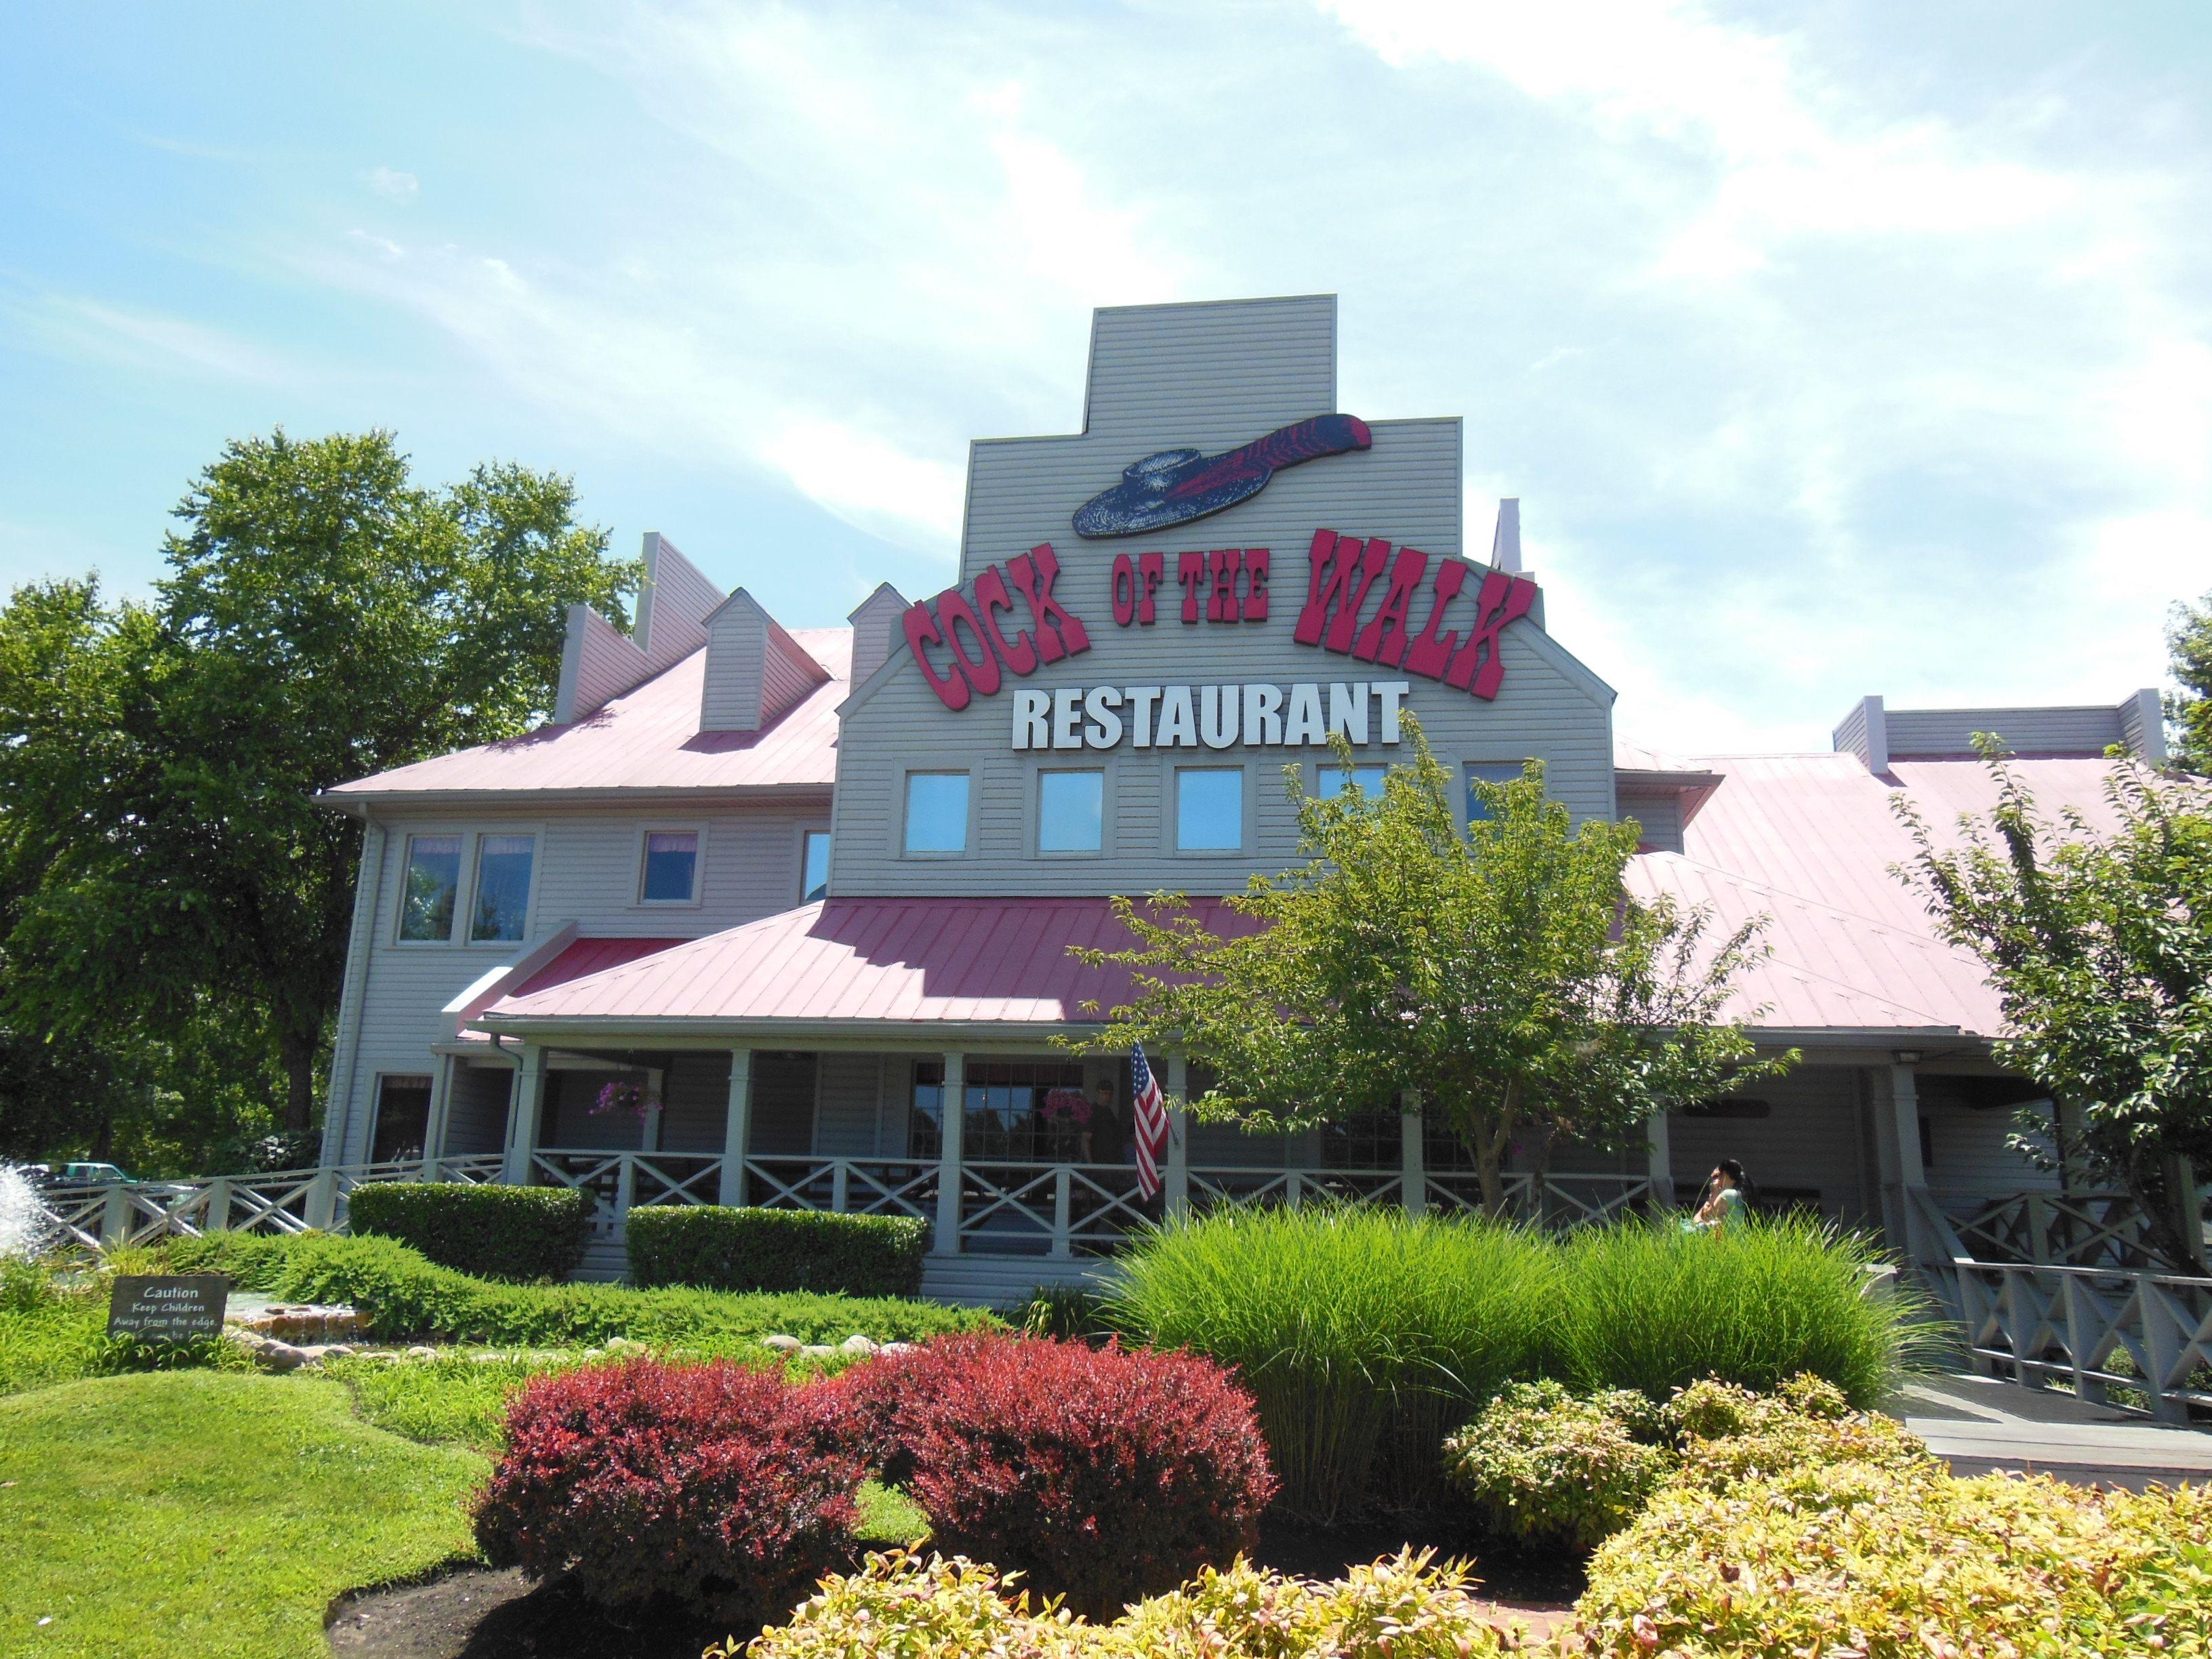 cock-of-the-walk-restaurant-mississippi